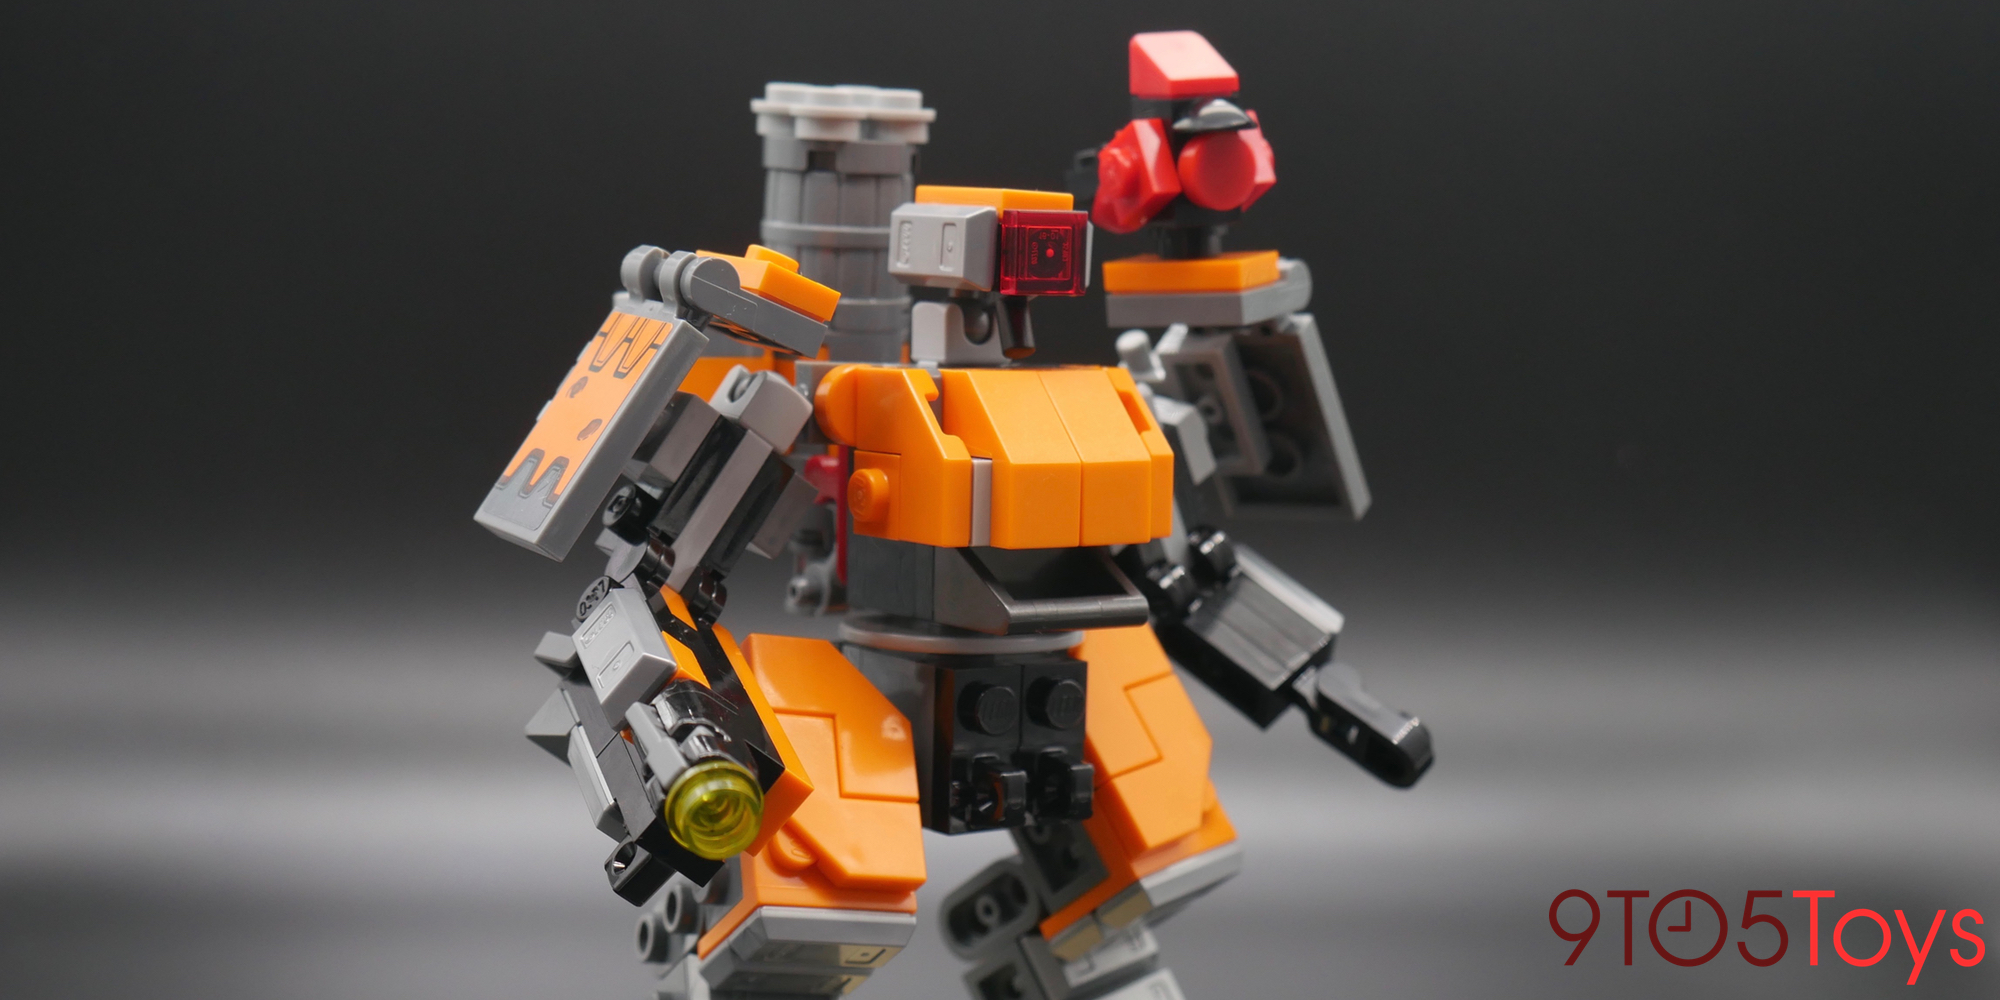 LEGO Overwatch Bastion Pose